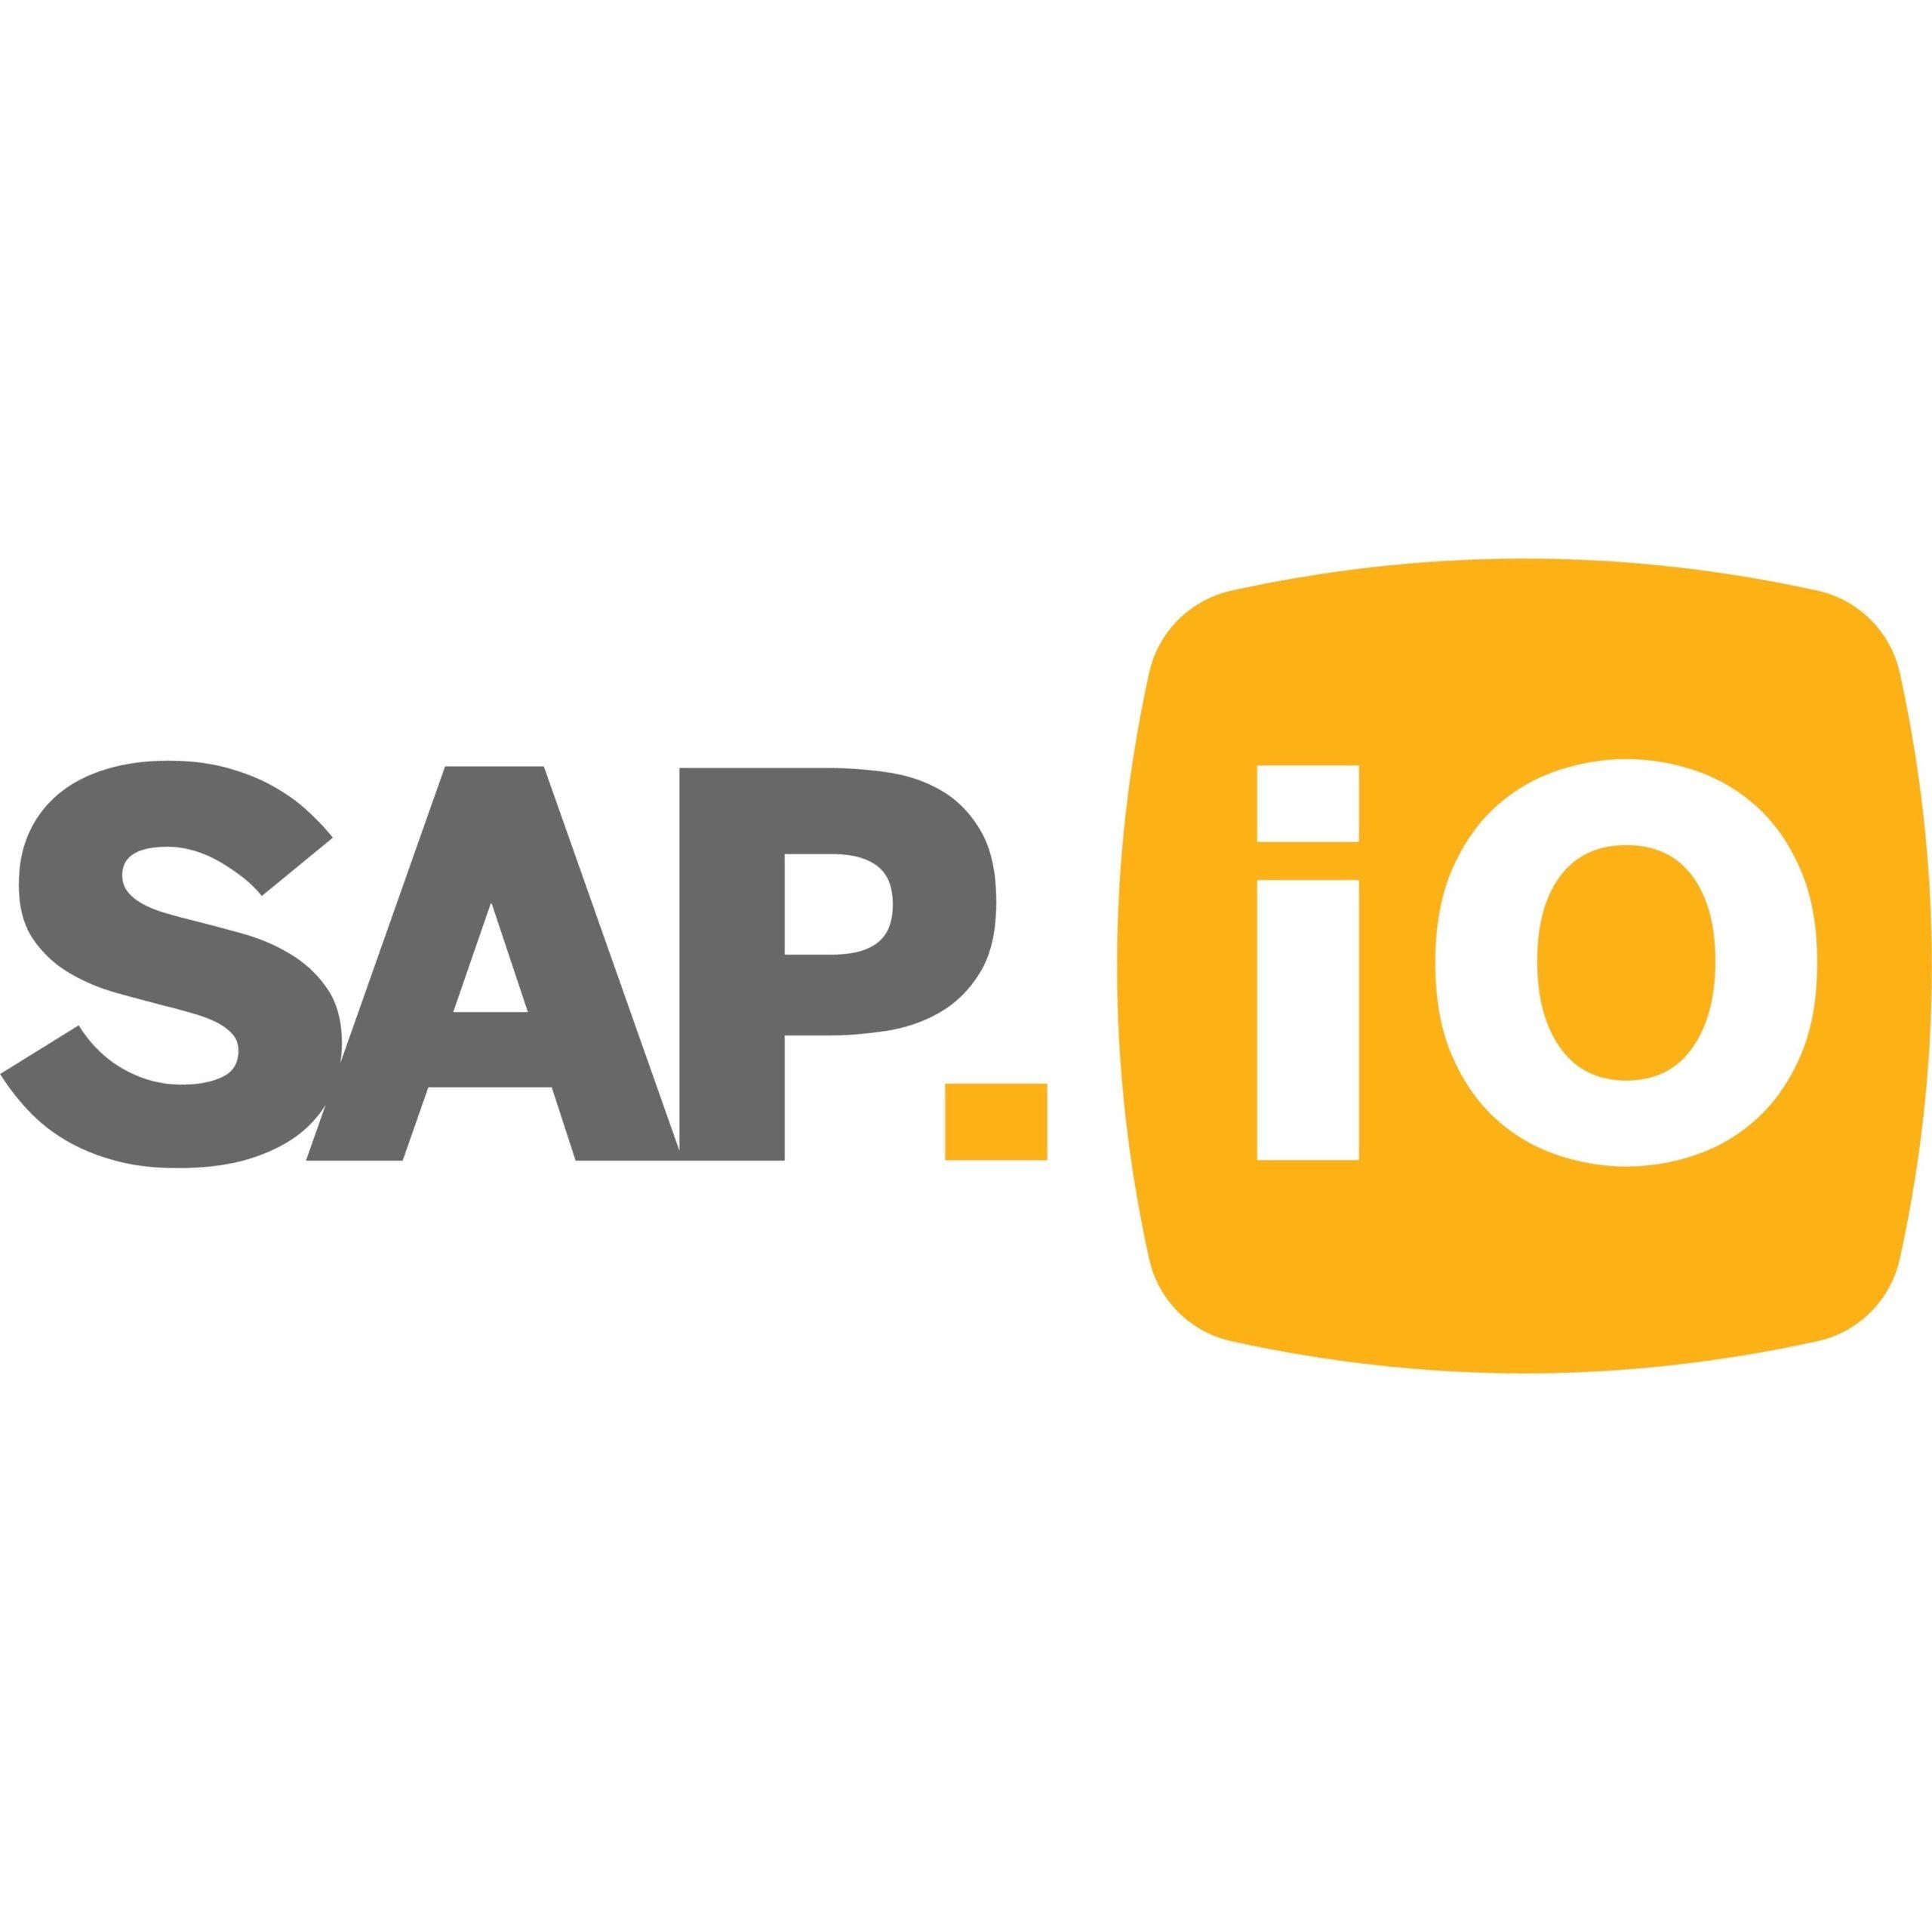 SAP iO Foundry Tel-Aviv